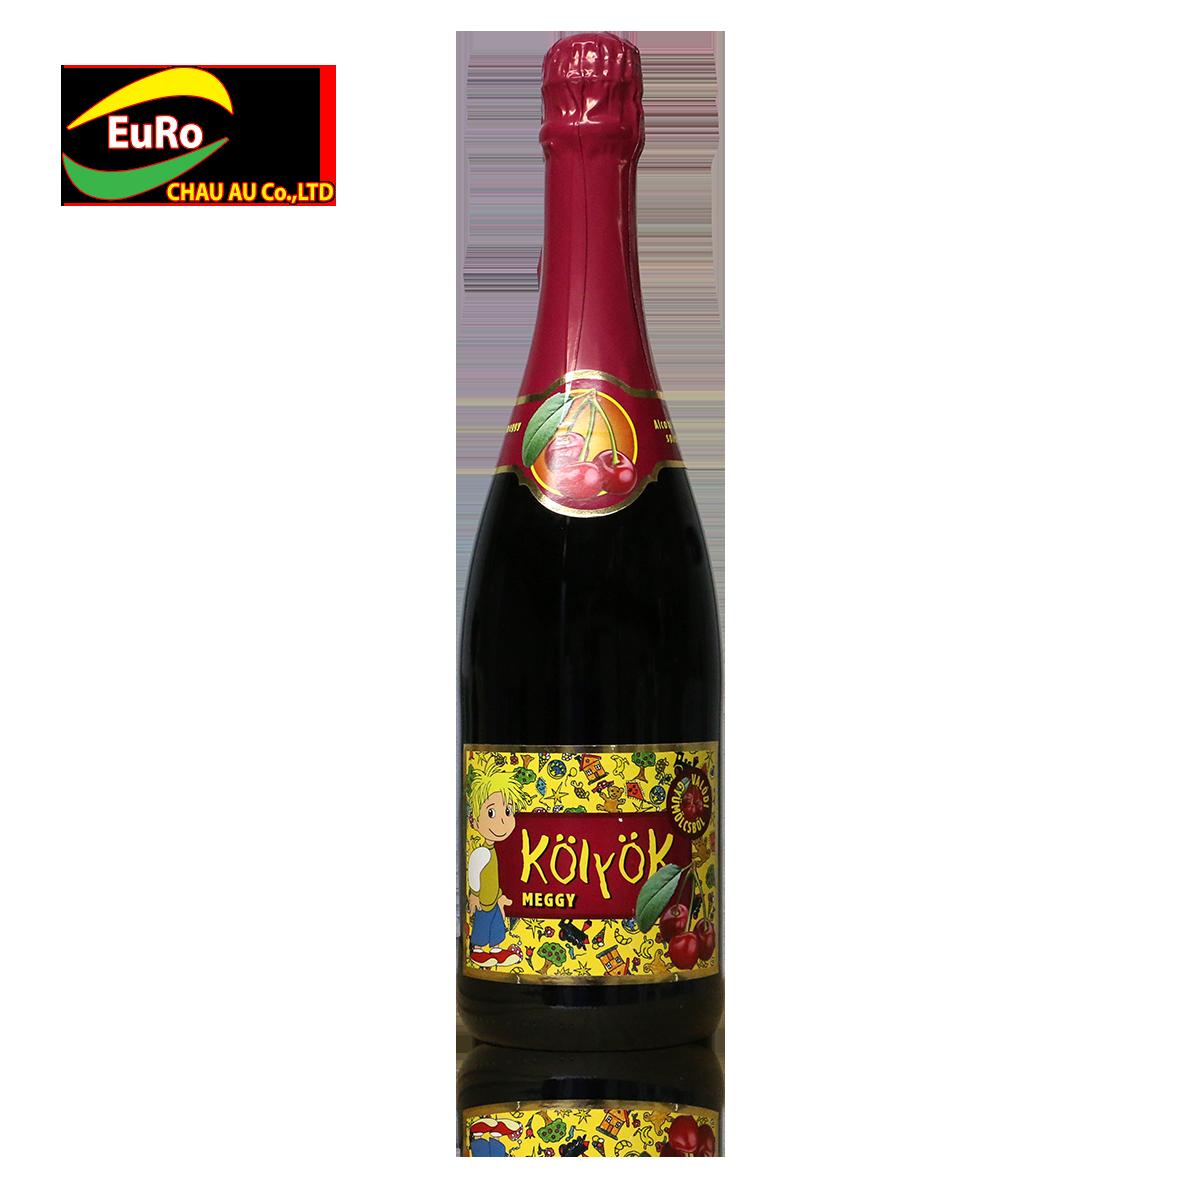 12 Koiyok cherry (Mat truoc) Tiki